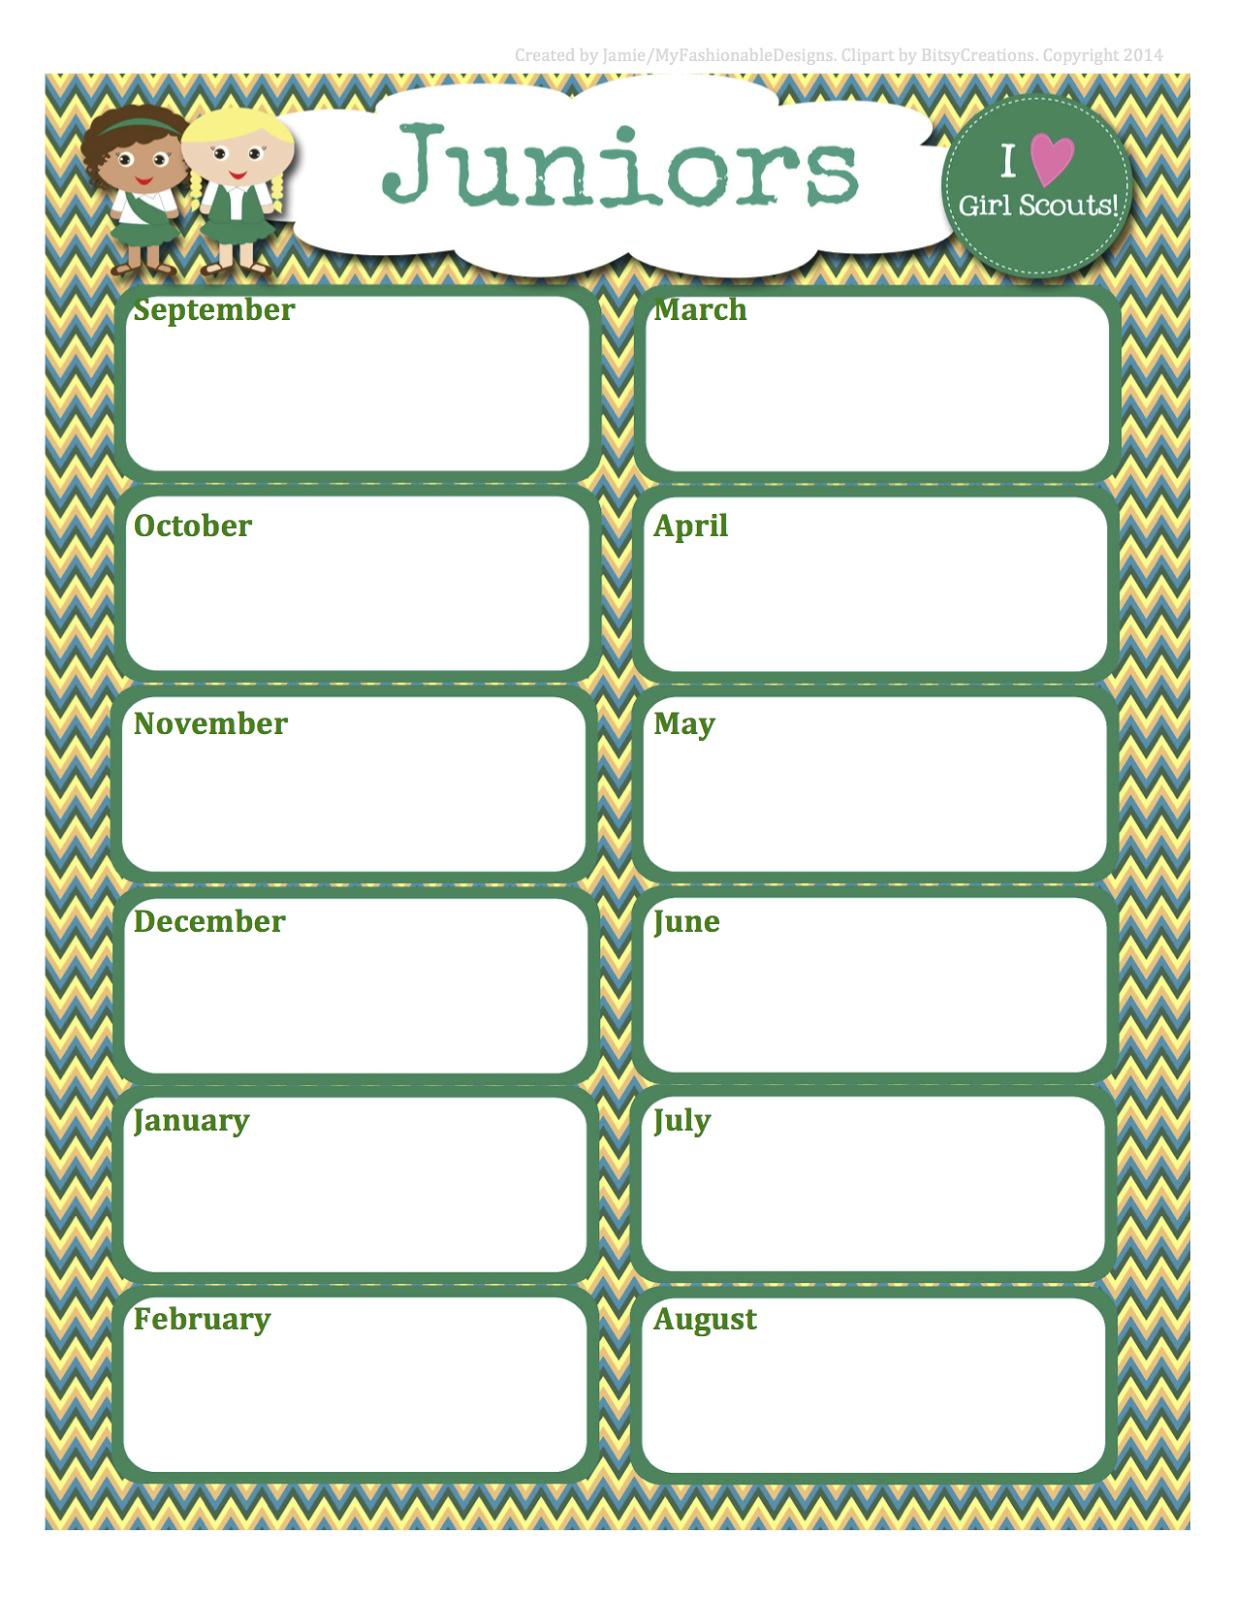 Girl Scouts Free Juniors Calendar